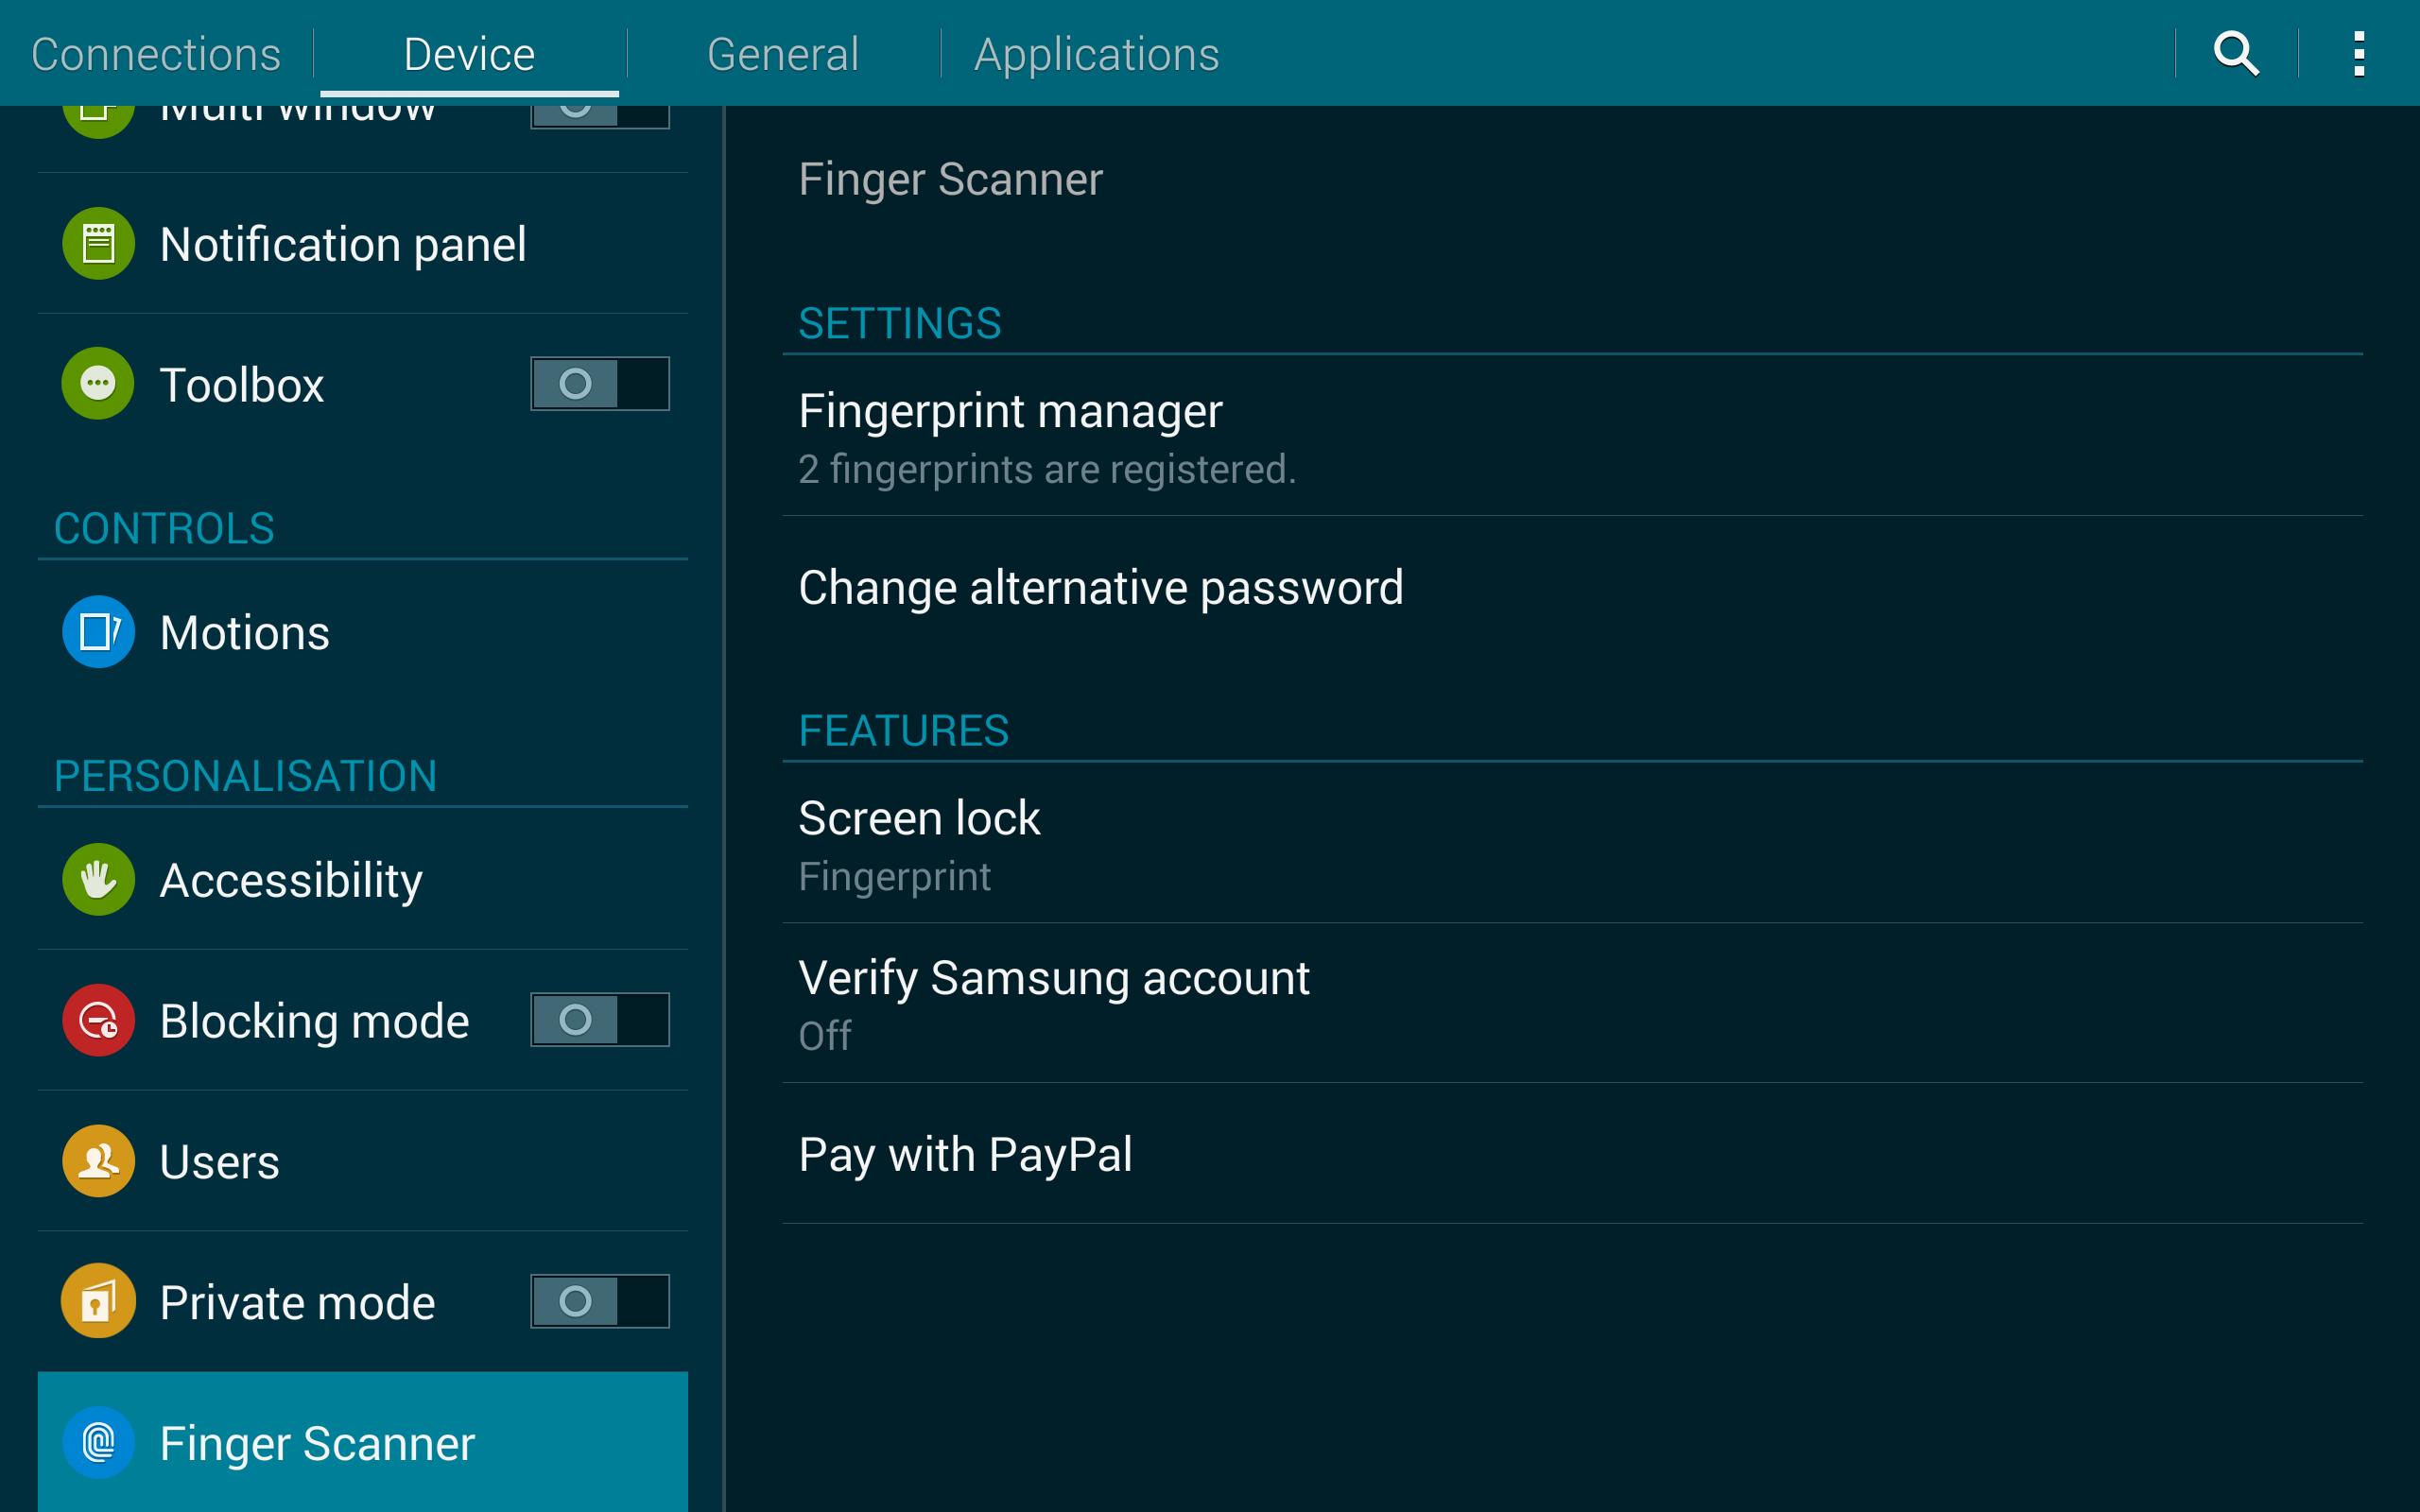 Tap Fingerprint Manager